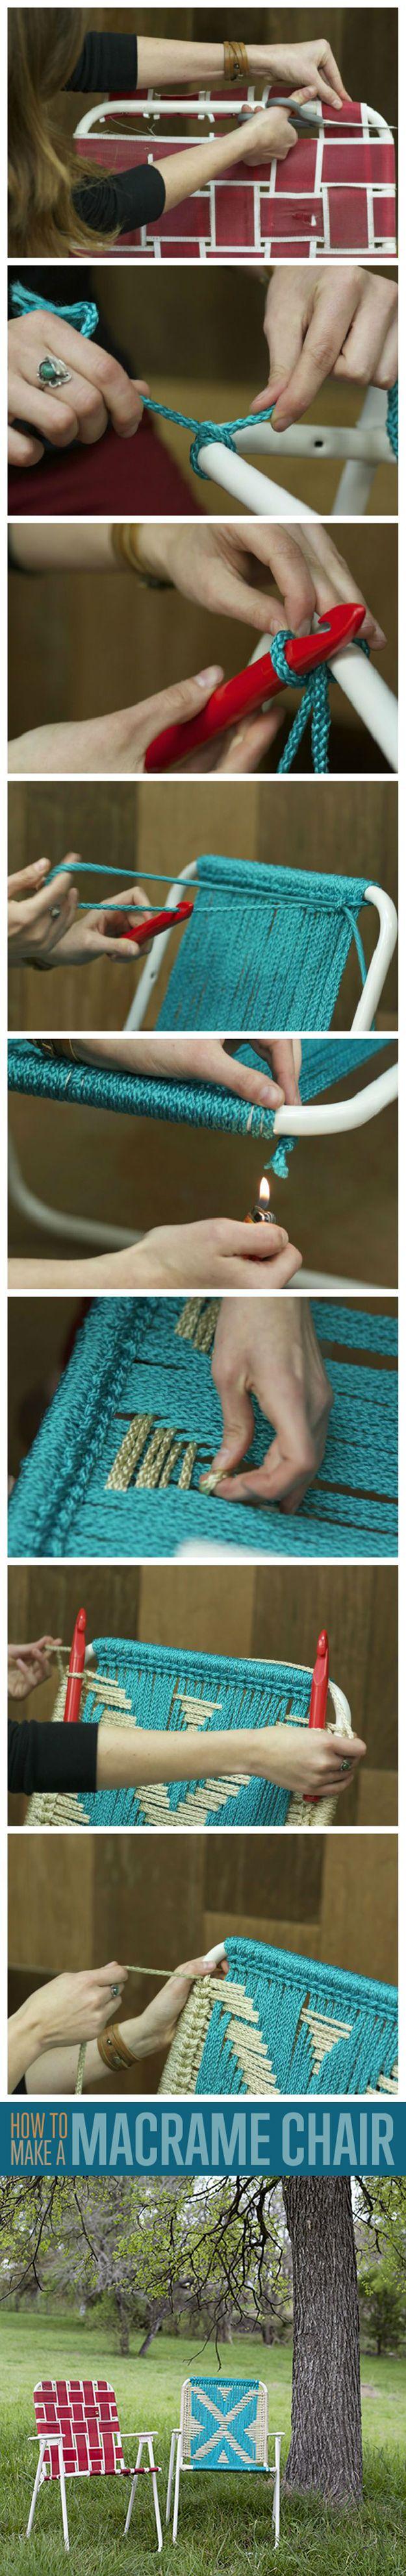 Ideas para sillas DIY Backyard muebles de jardín | artesaniasdebricolaje.ru/diy-projects-backyard-furniture/